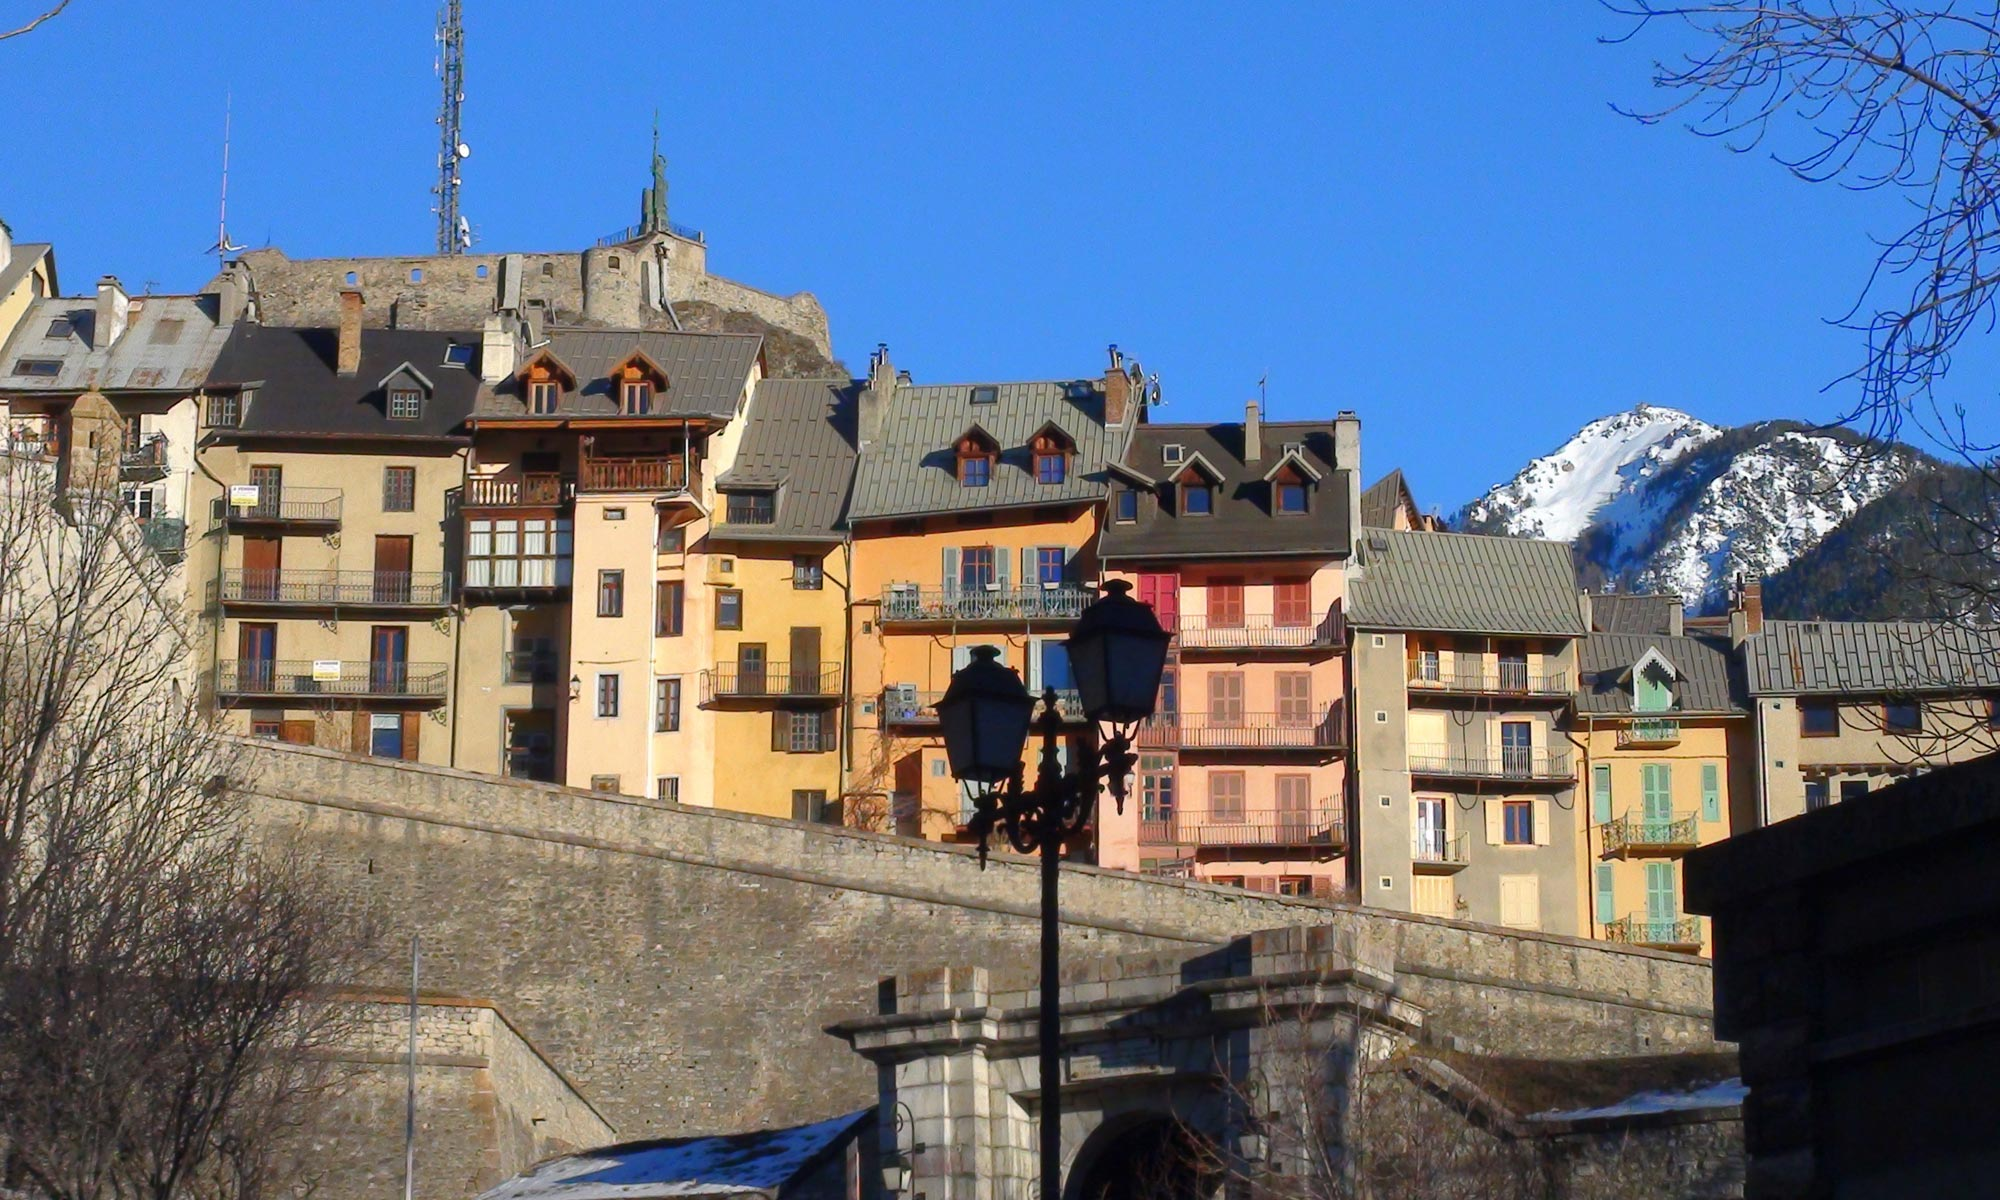 Club de bridge de Briançon - Serre Chevalier